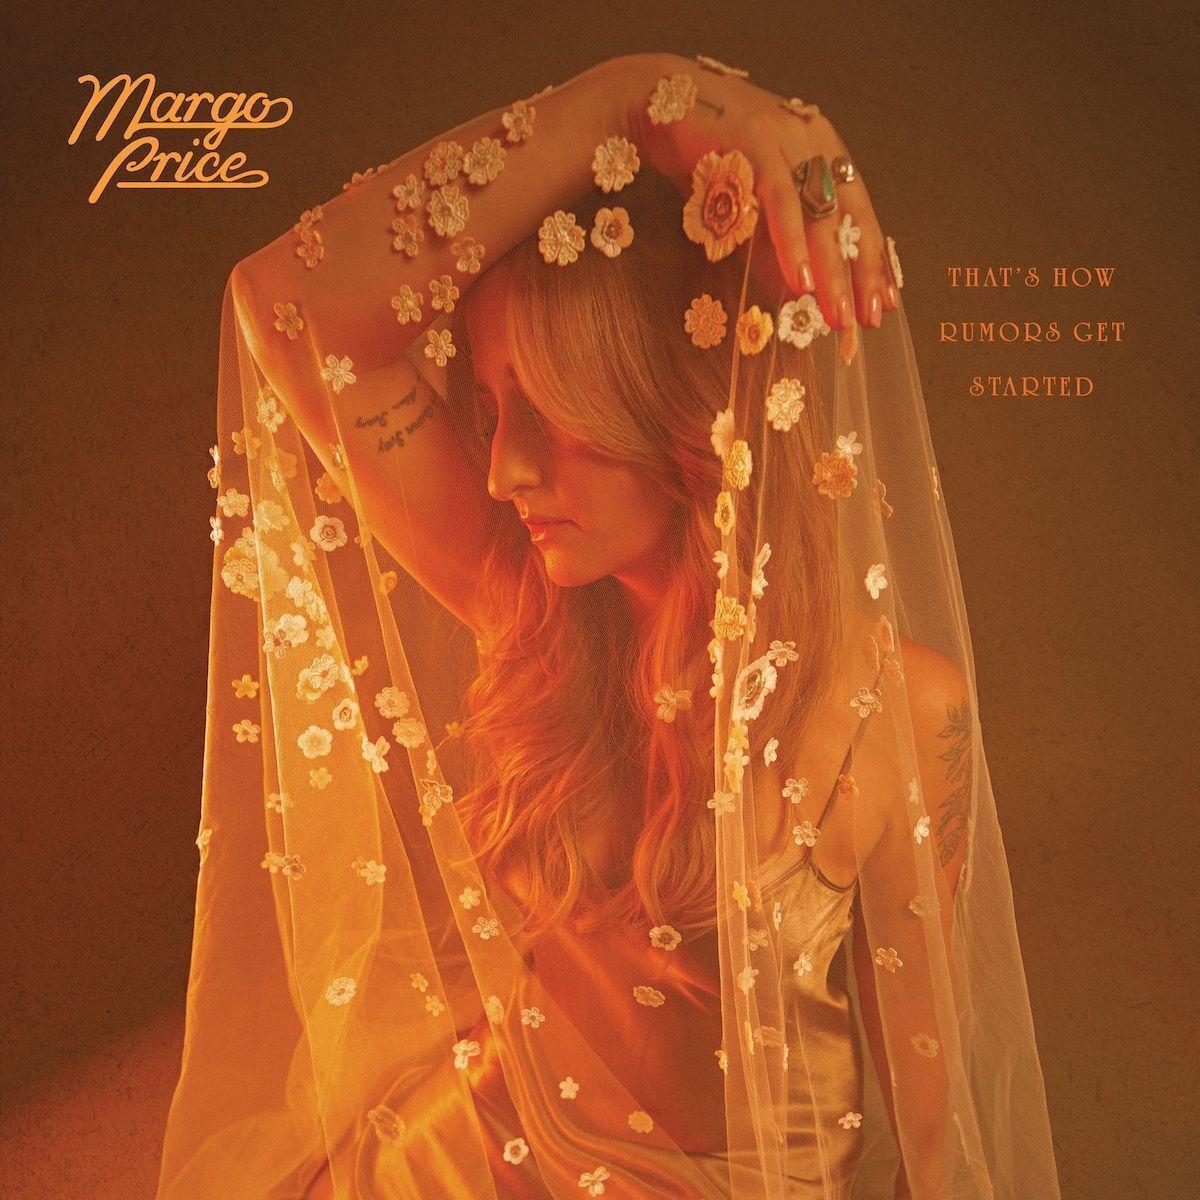 Margo Price alb cover.jpg